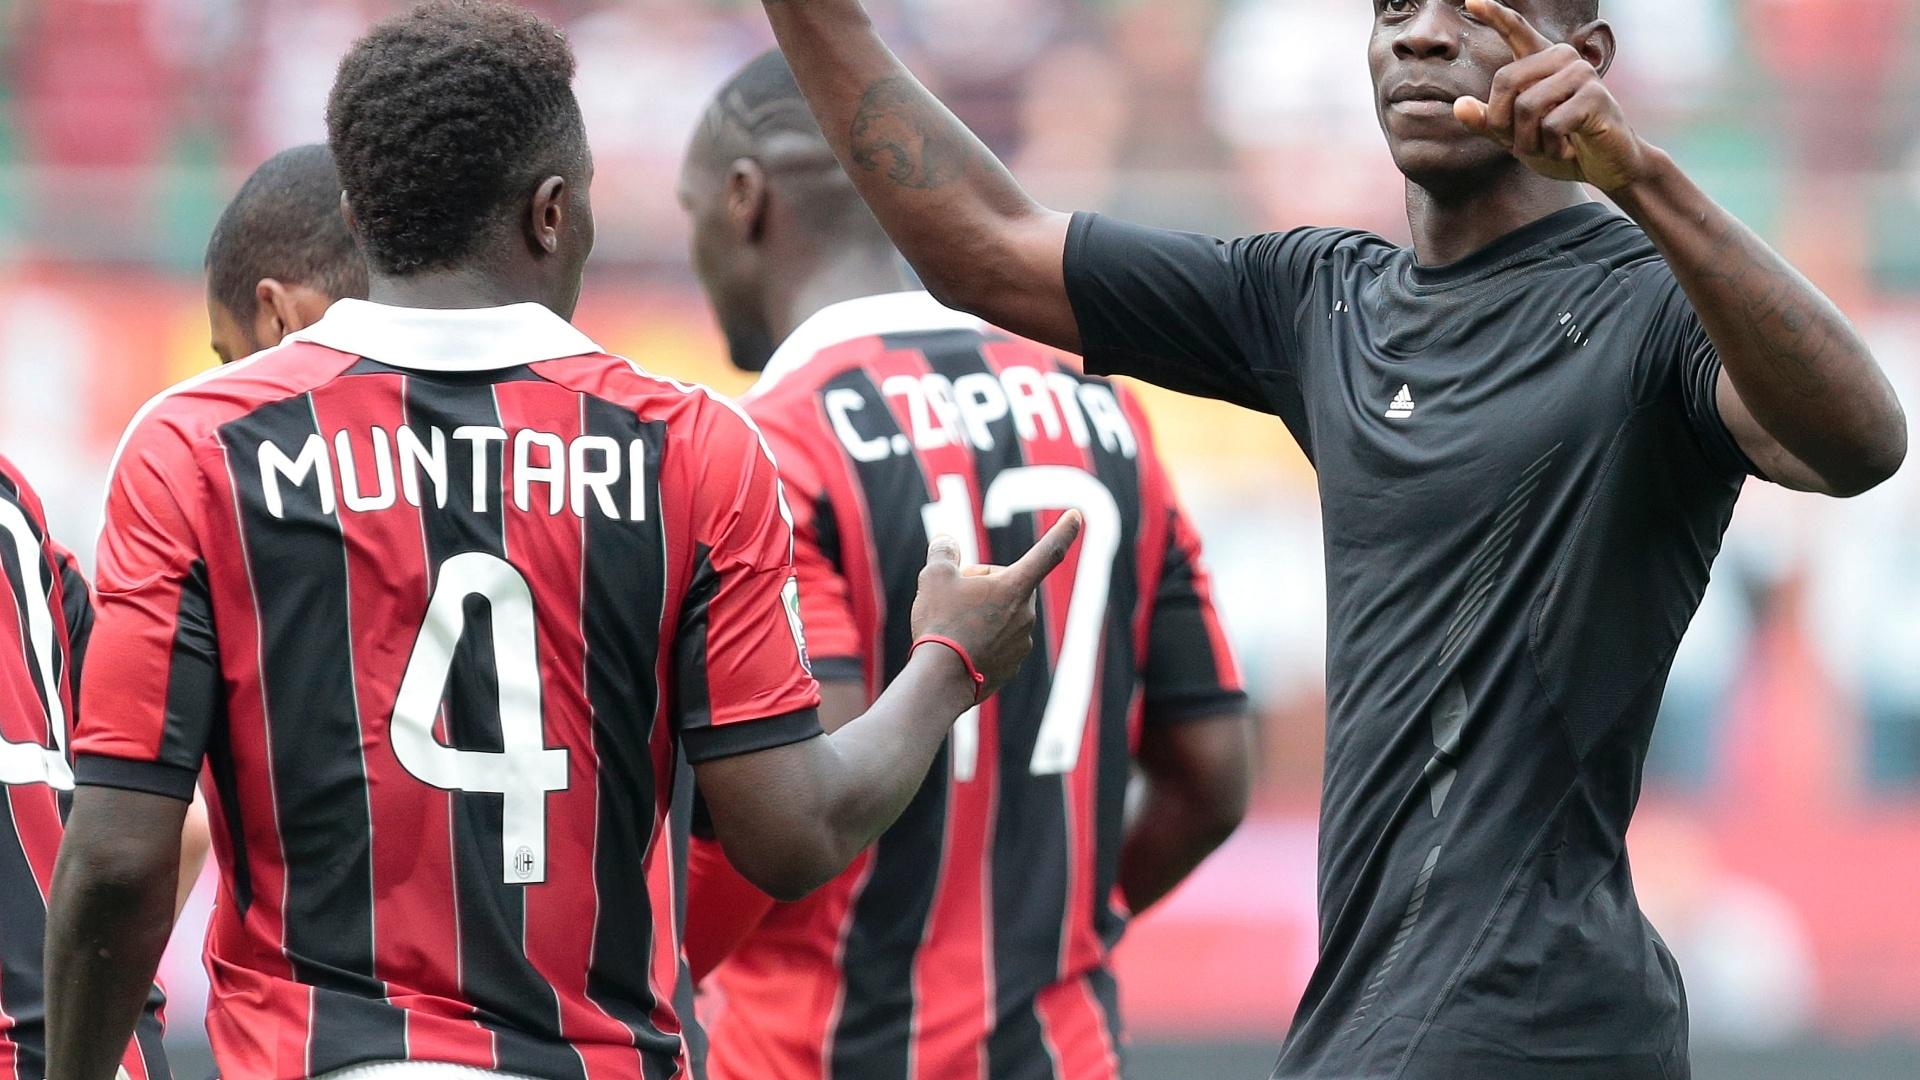 06.mai.2013 - Muntari e Balotelli comemoram gol do Milan sobre o Torino pelo Campeonato Italiano